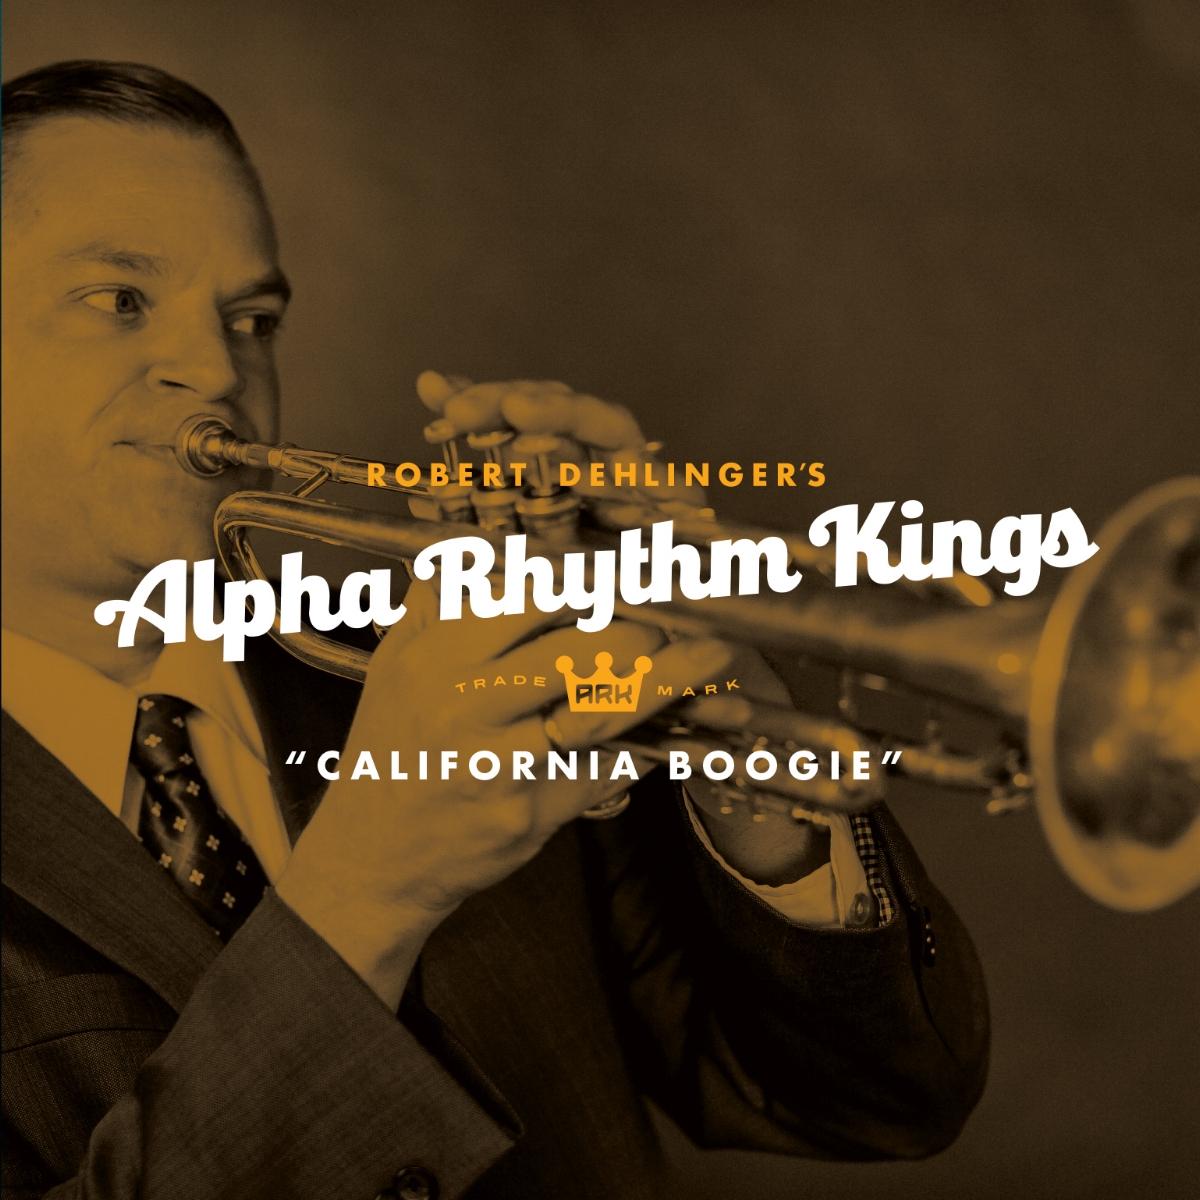 California Boogie, by Robert Dehlinger's Alpha Rhythm Kings